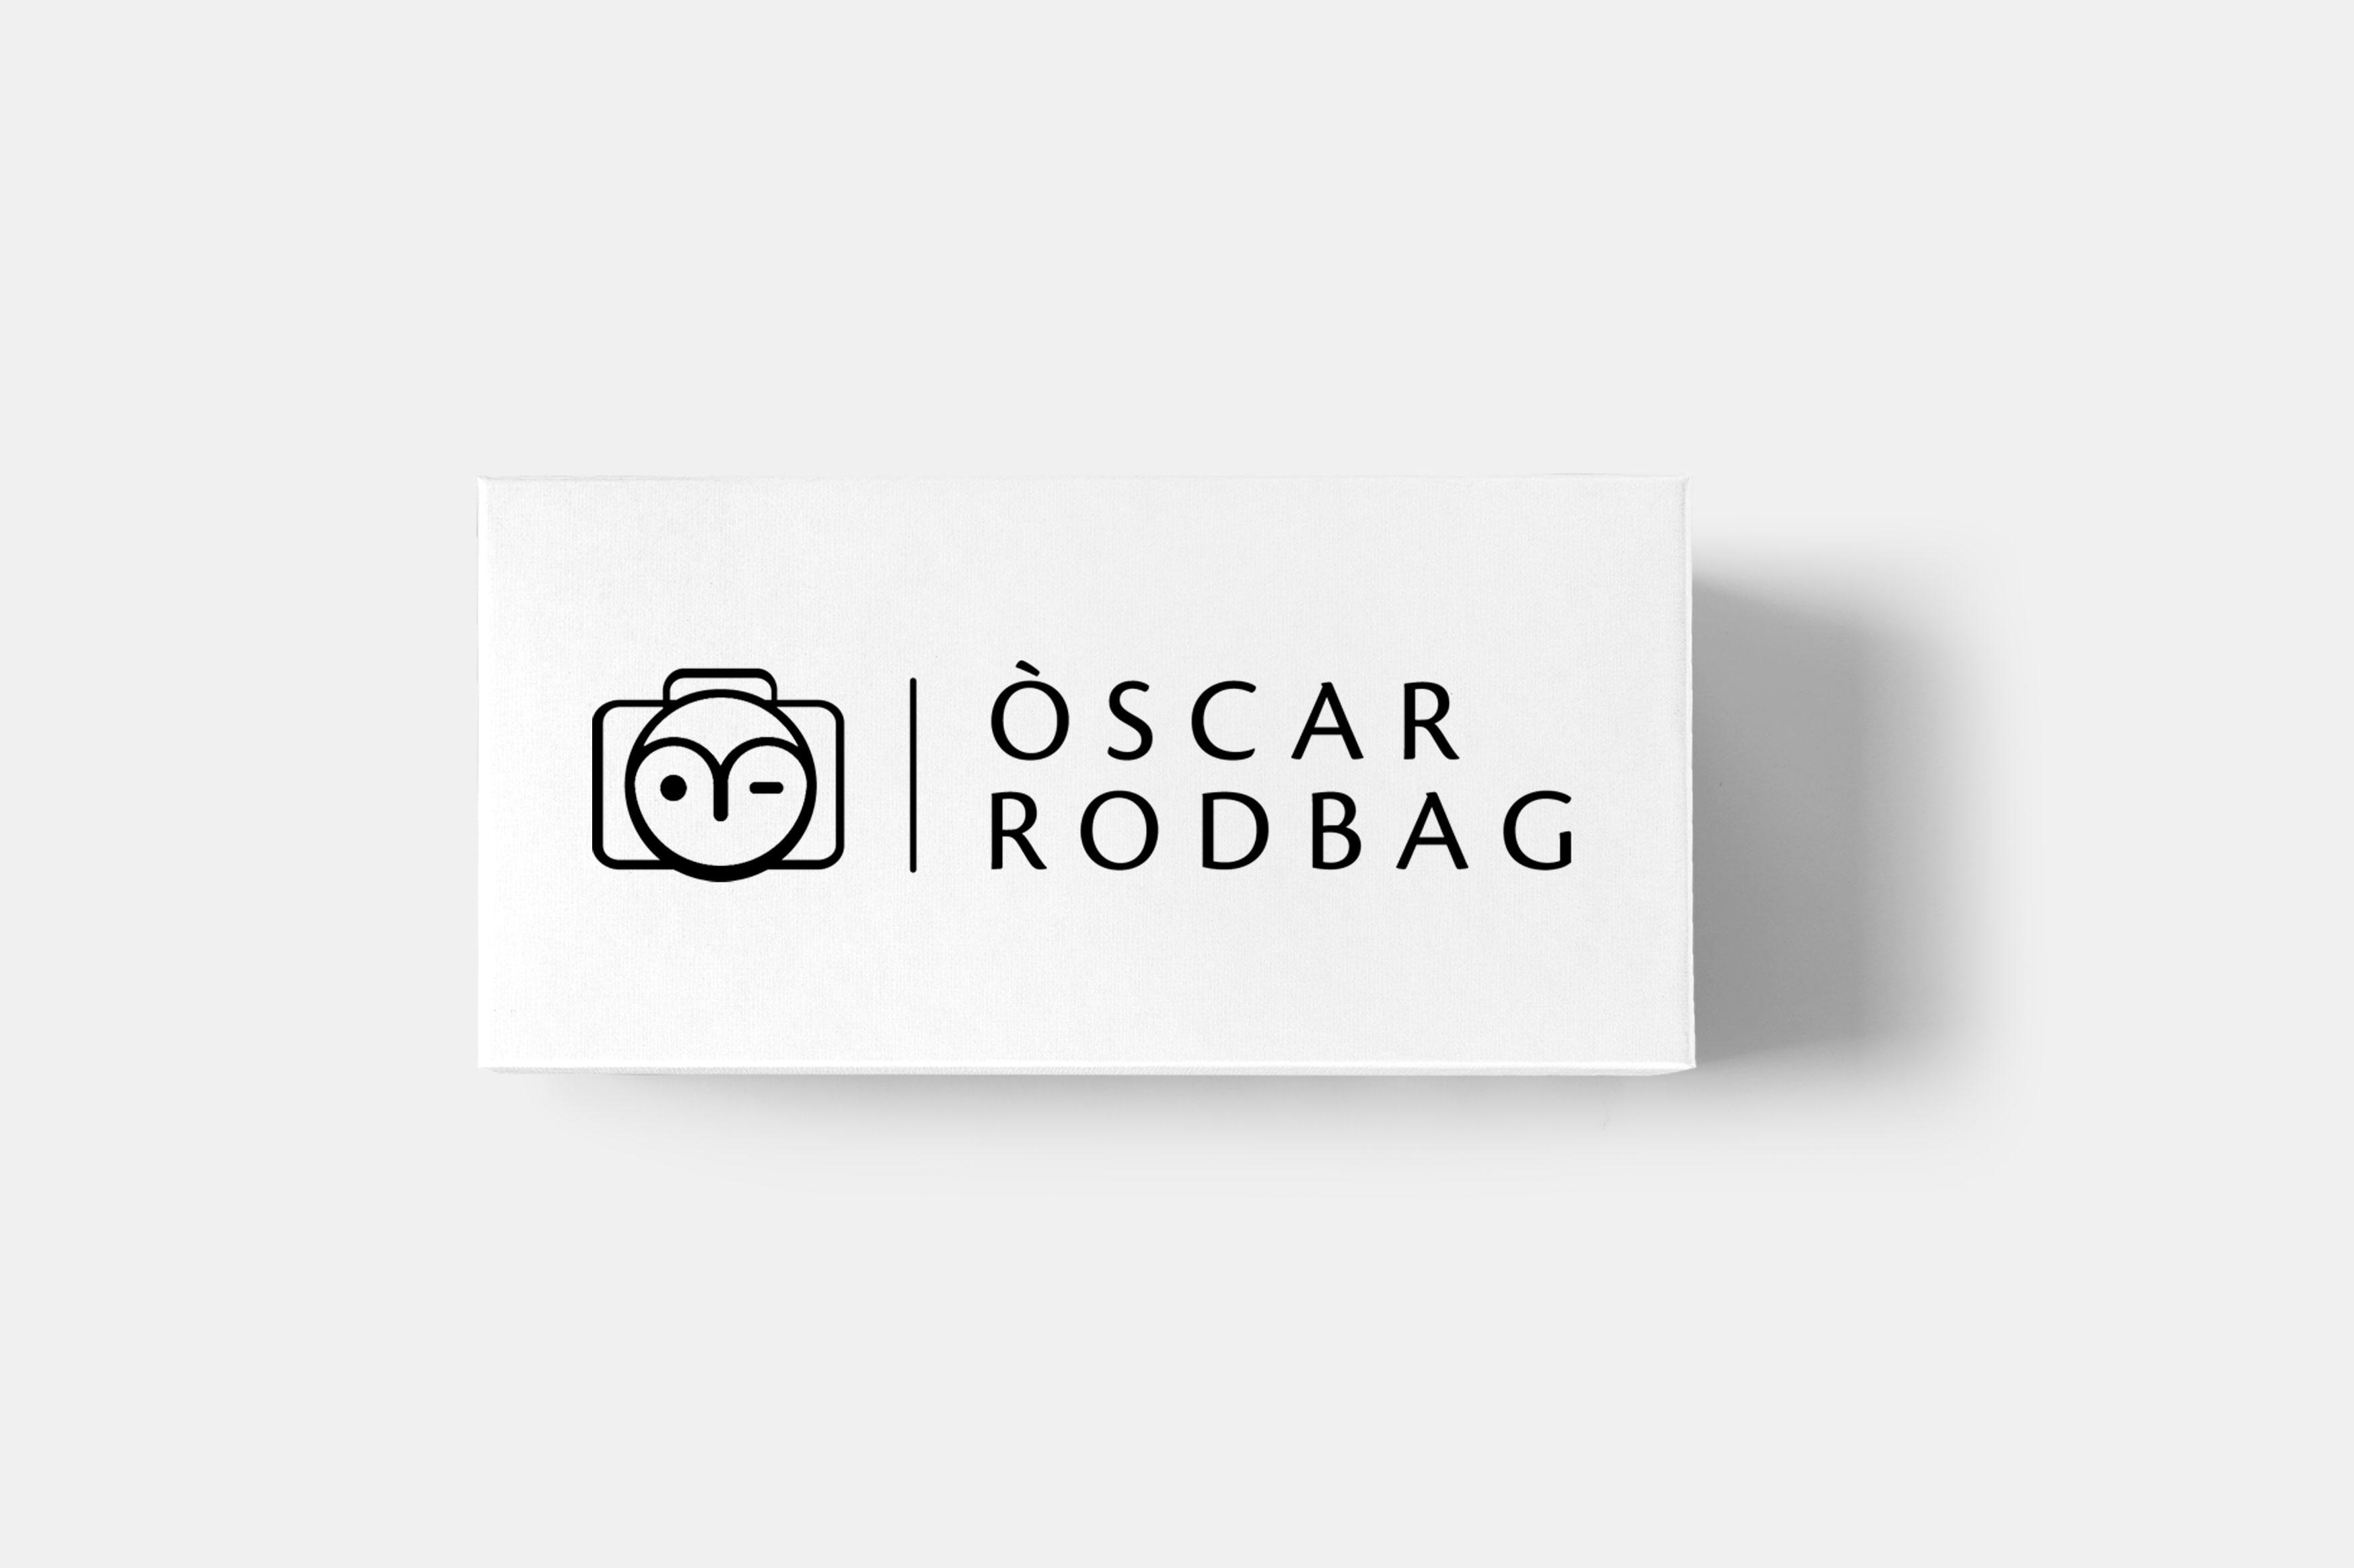 Oacar-Rodbag-Project-Branding-Disseny-00